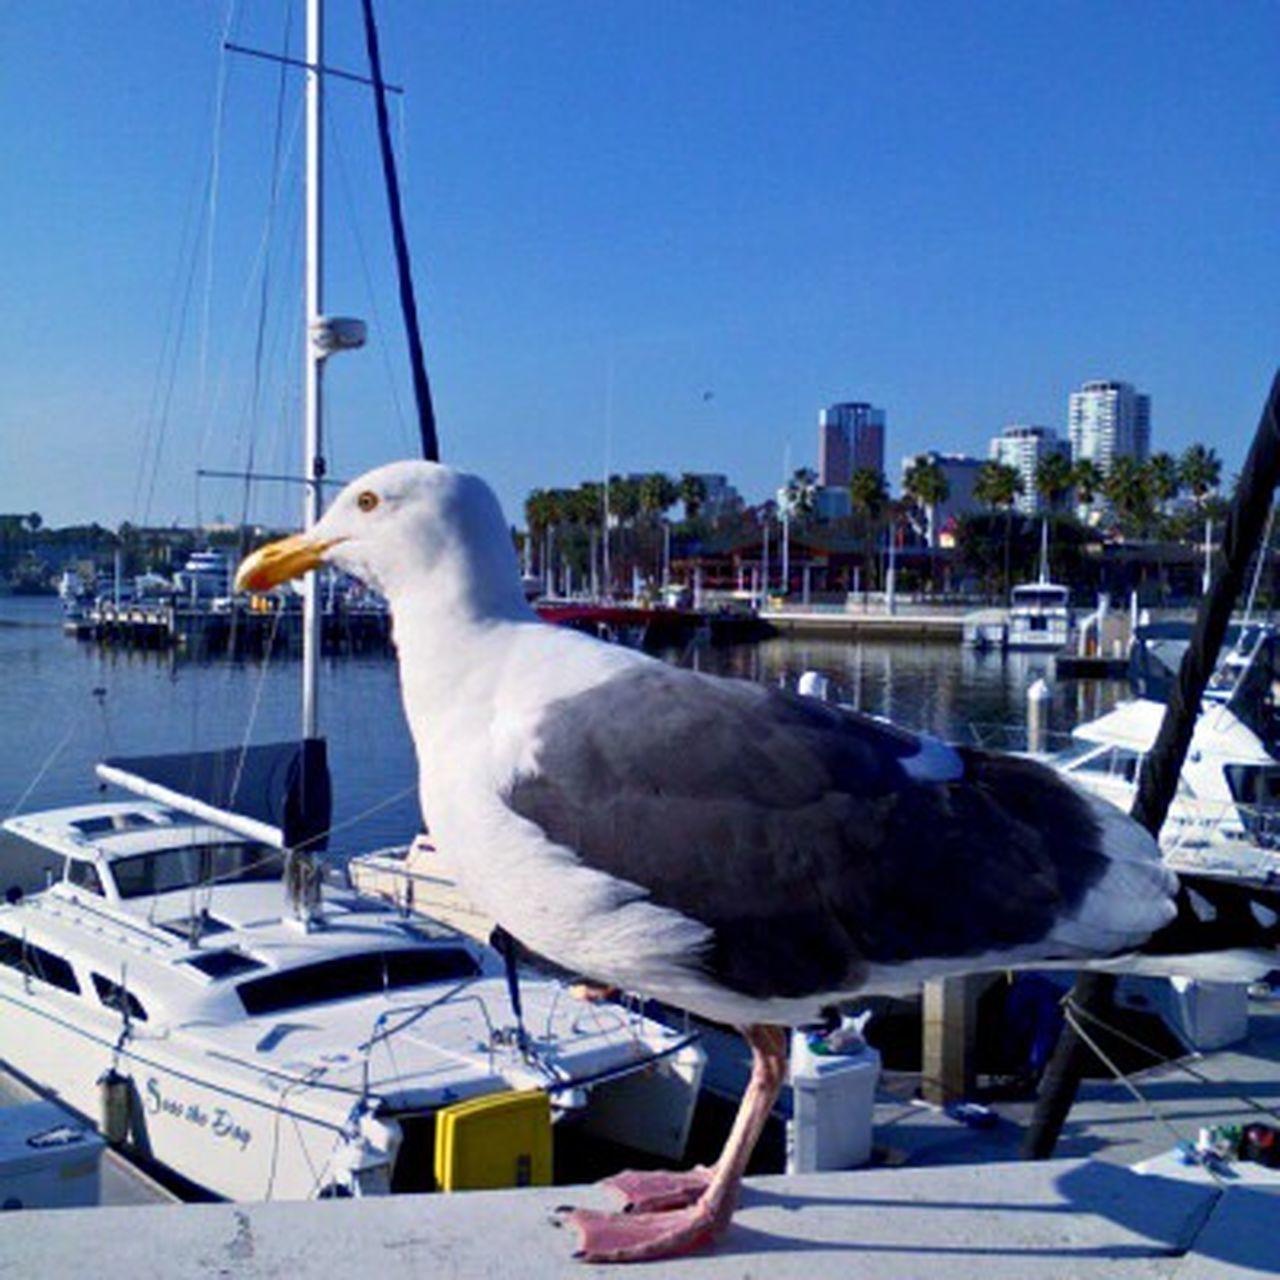 Animal Themes Bird Harbor Sailboat Close Up